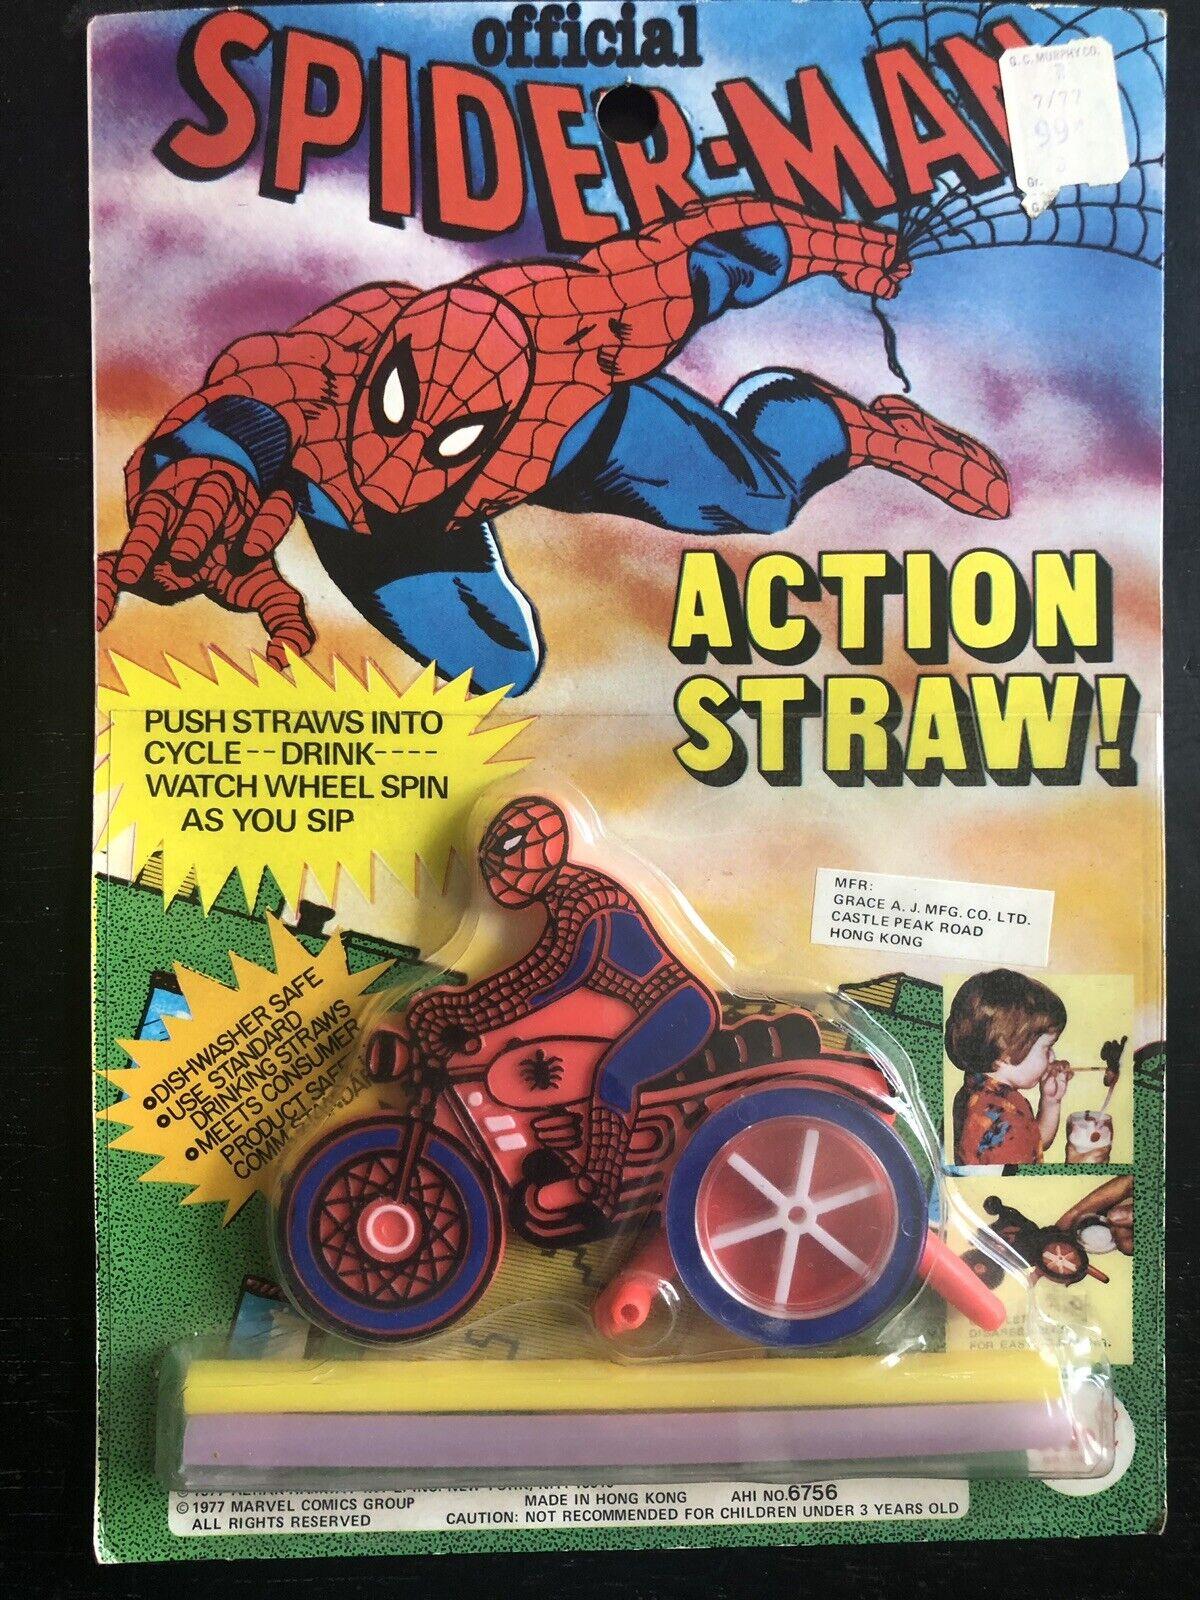 RARE OFFICIAL SPIDER-MAN Wirkung STRAW 1977 AHI Marvel Comics Group Azrak Hamway